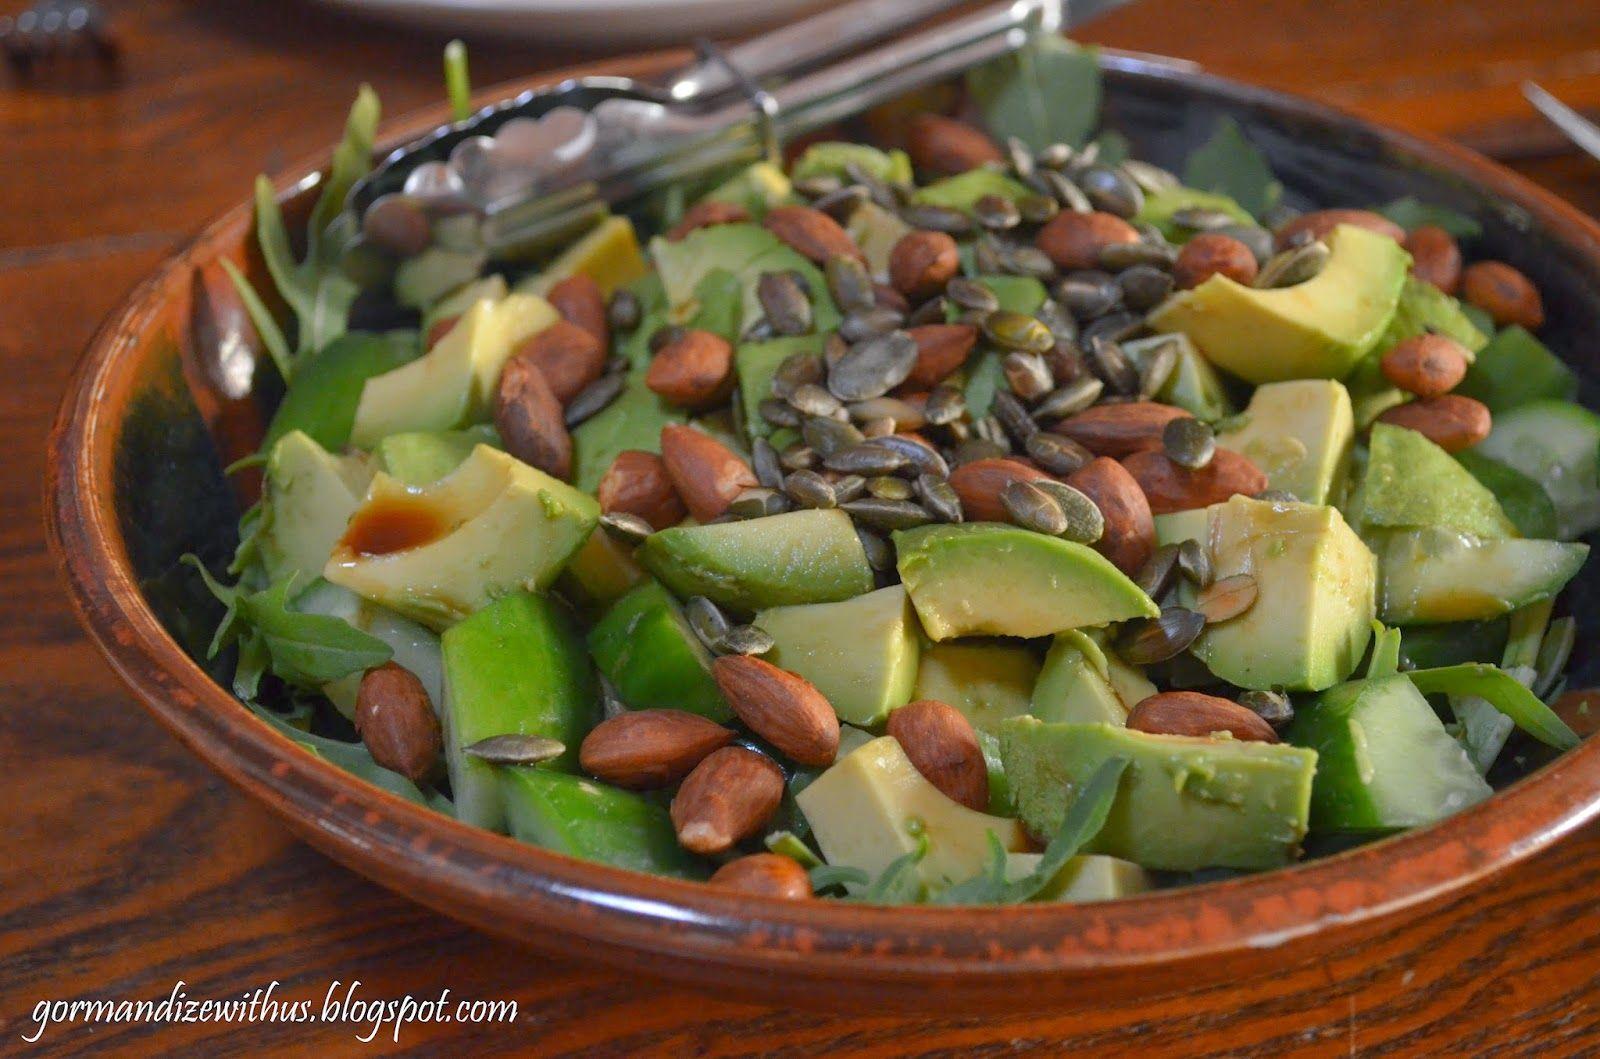 Avocado, Rocket and Almond Salad by Gormandize